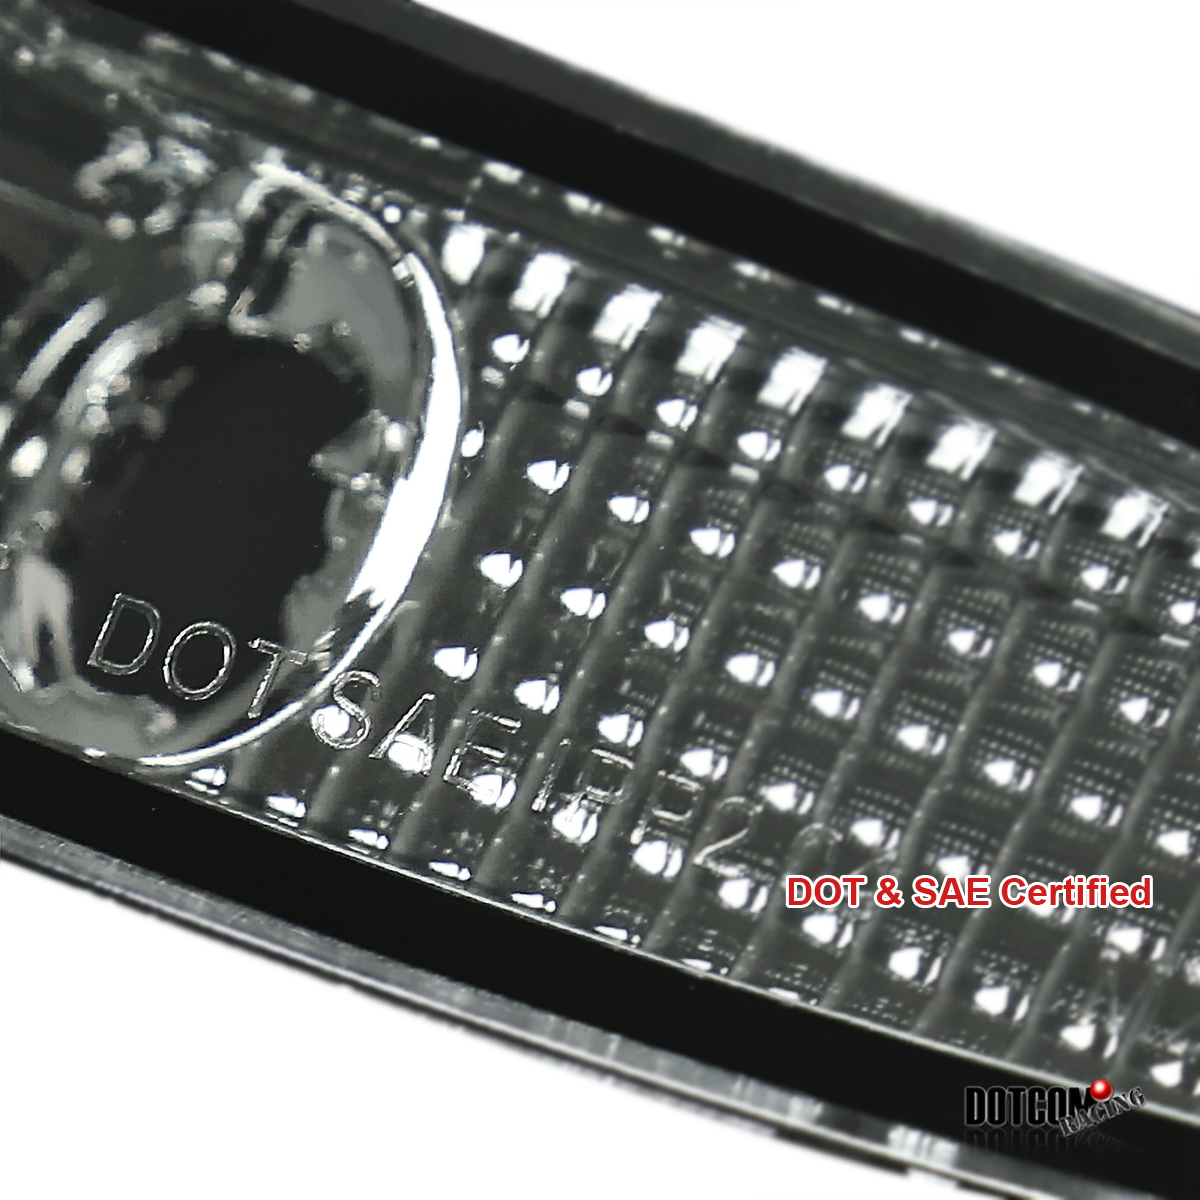 2003-2008 Mazda 6 Mazda6 Bumper Lamps Side Marker Lights Pair JDM Smoke Lens